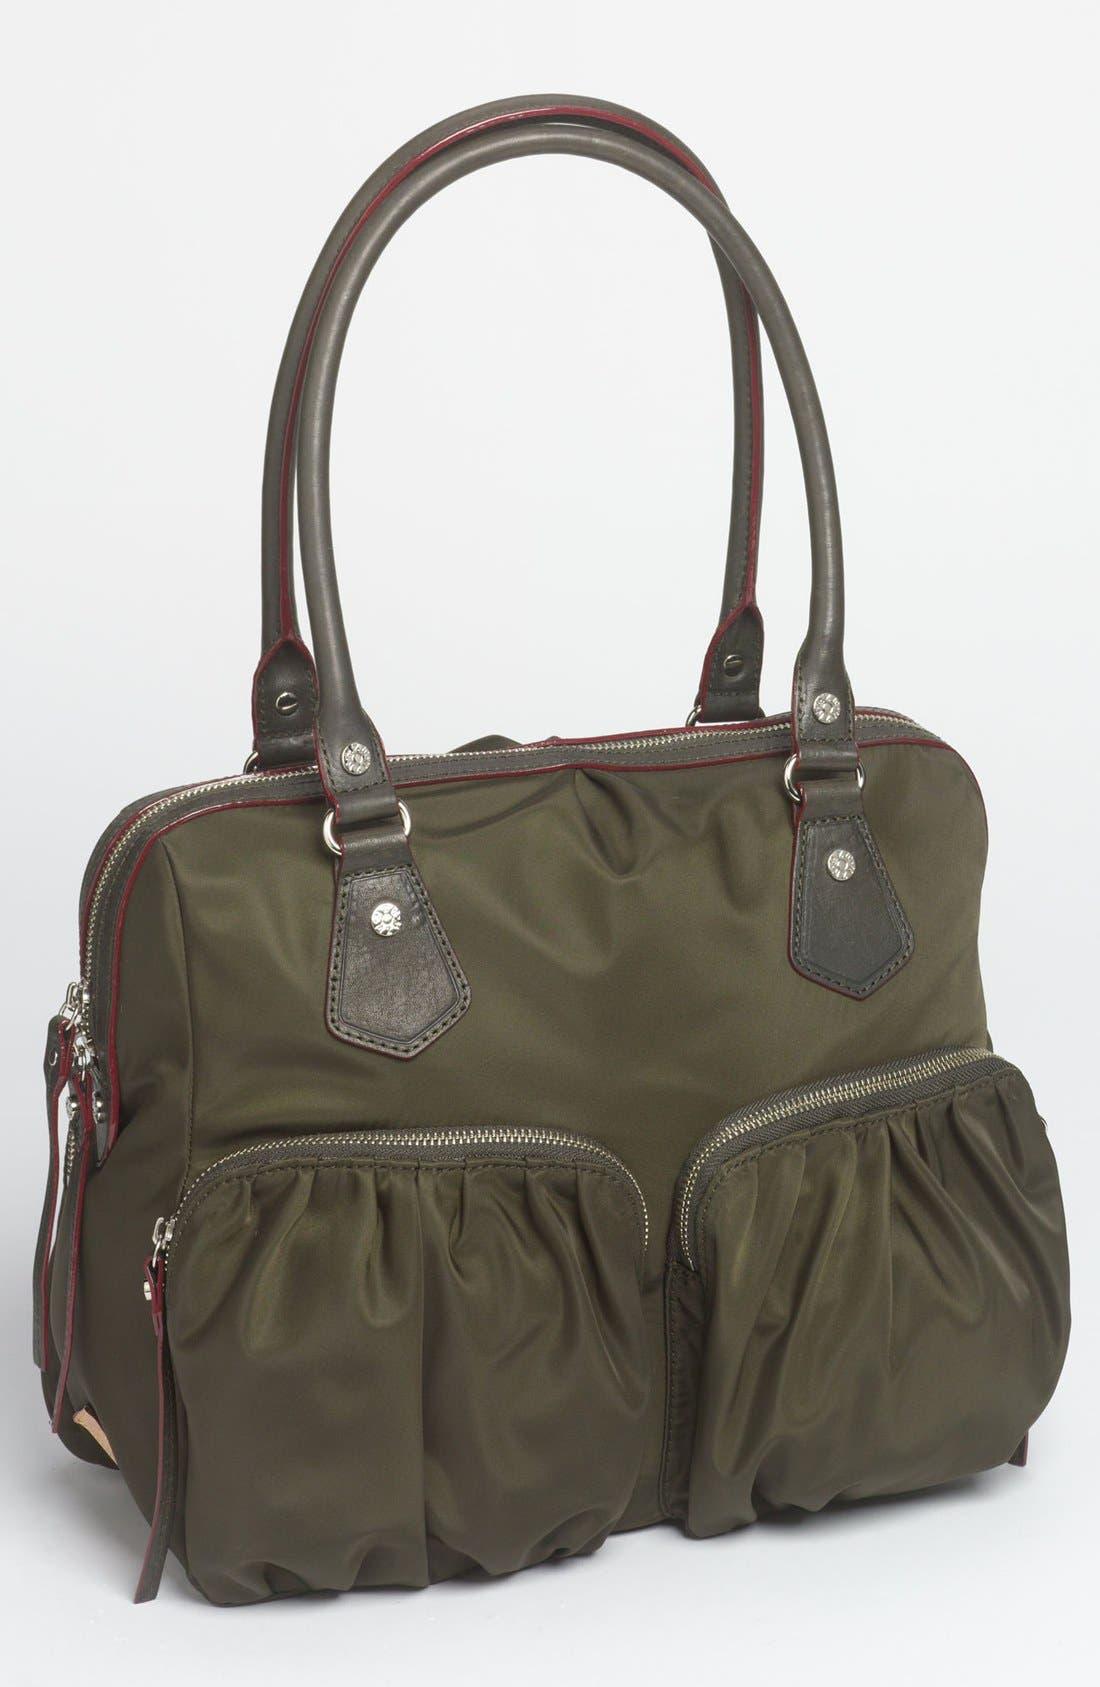 Main Image - MZ Wallace 'Jane' Handbag, Medium